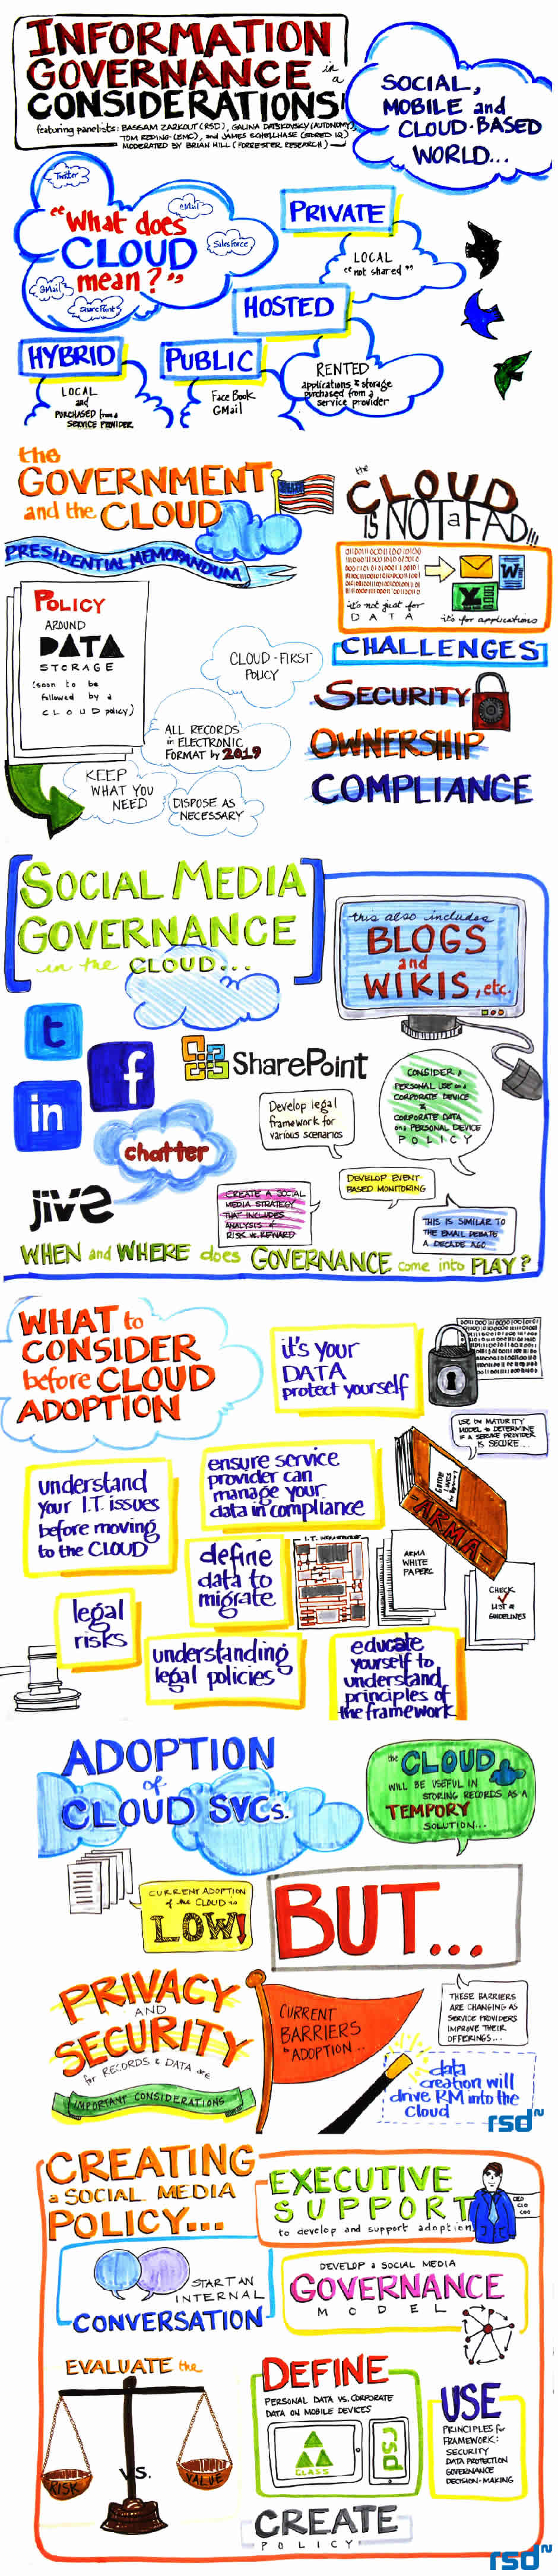 ig-information-governance-considerations-social-mobile-cloud-based-world_w940